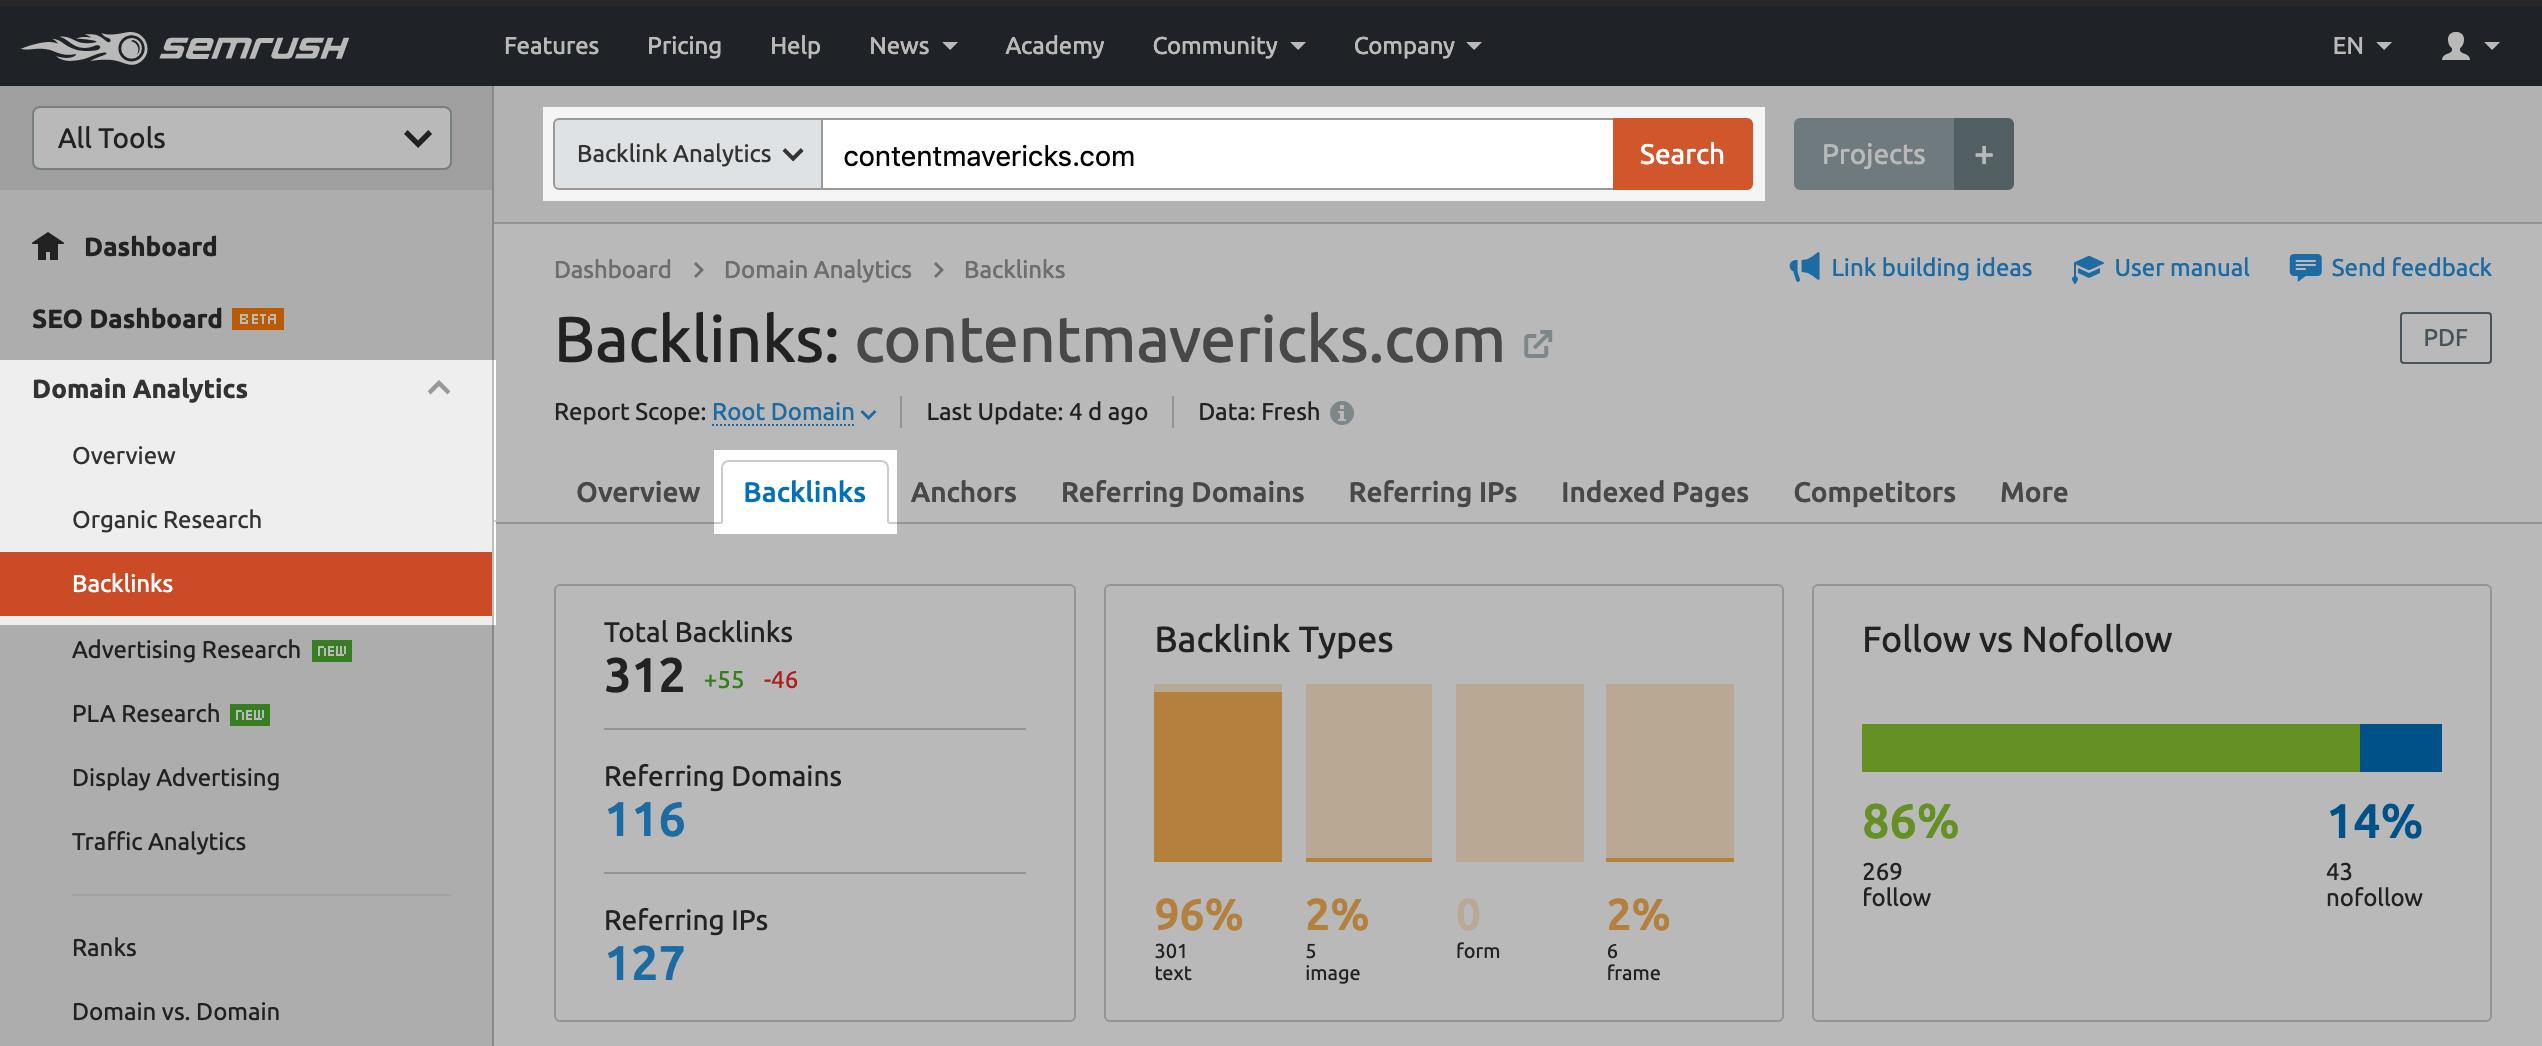 backlinks metrics image